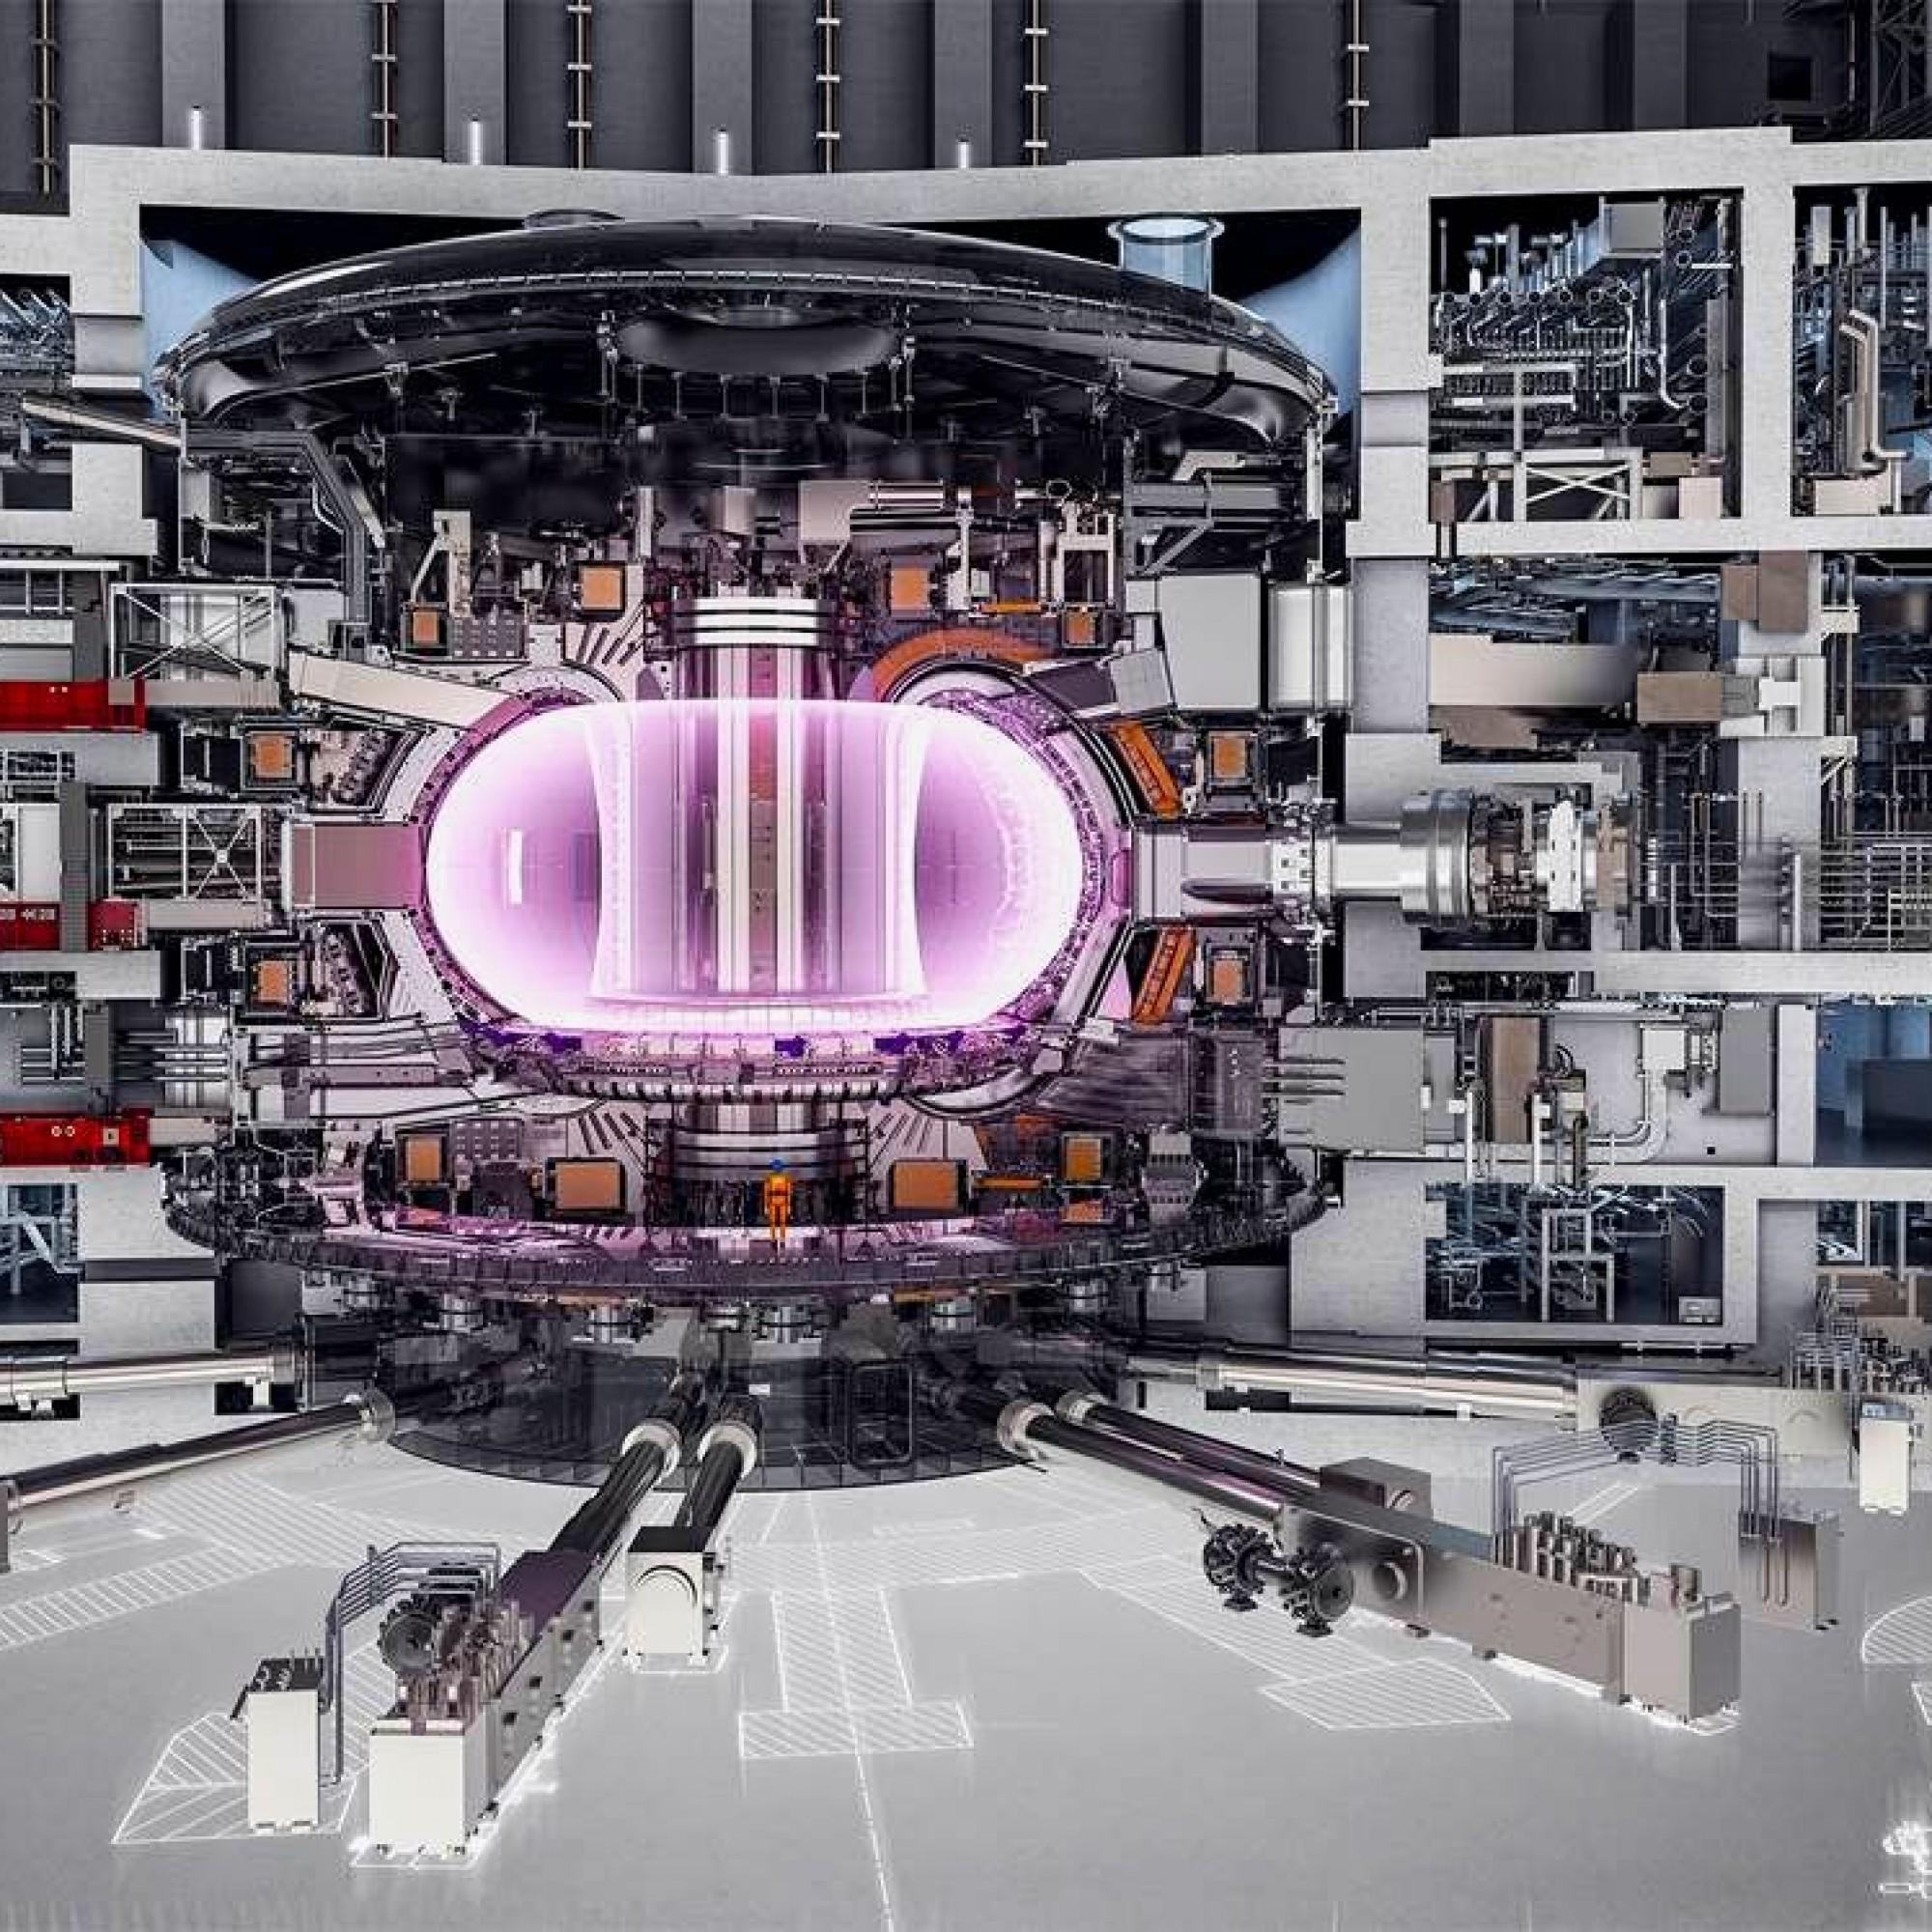 Schnitt durch den Tokamak-Fusionsreaktor.